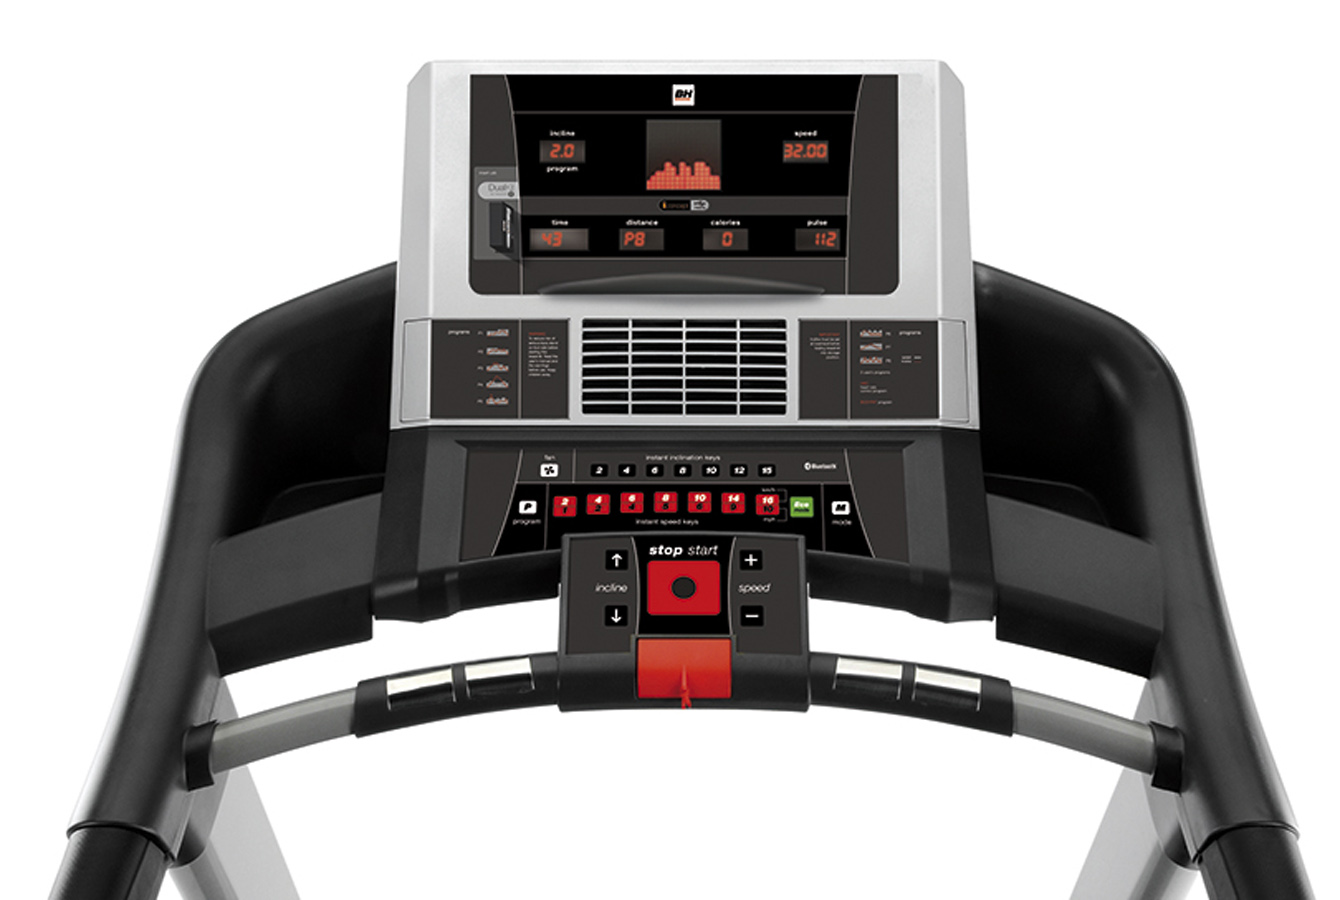 BH Fitness i.F12